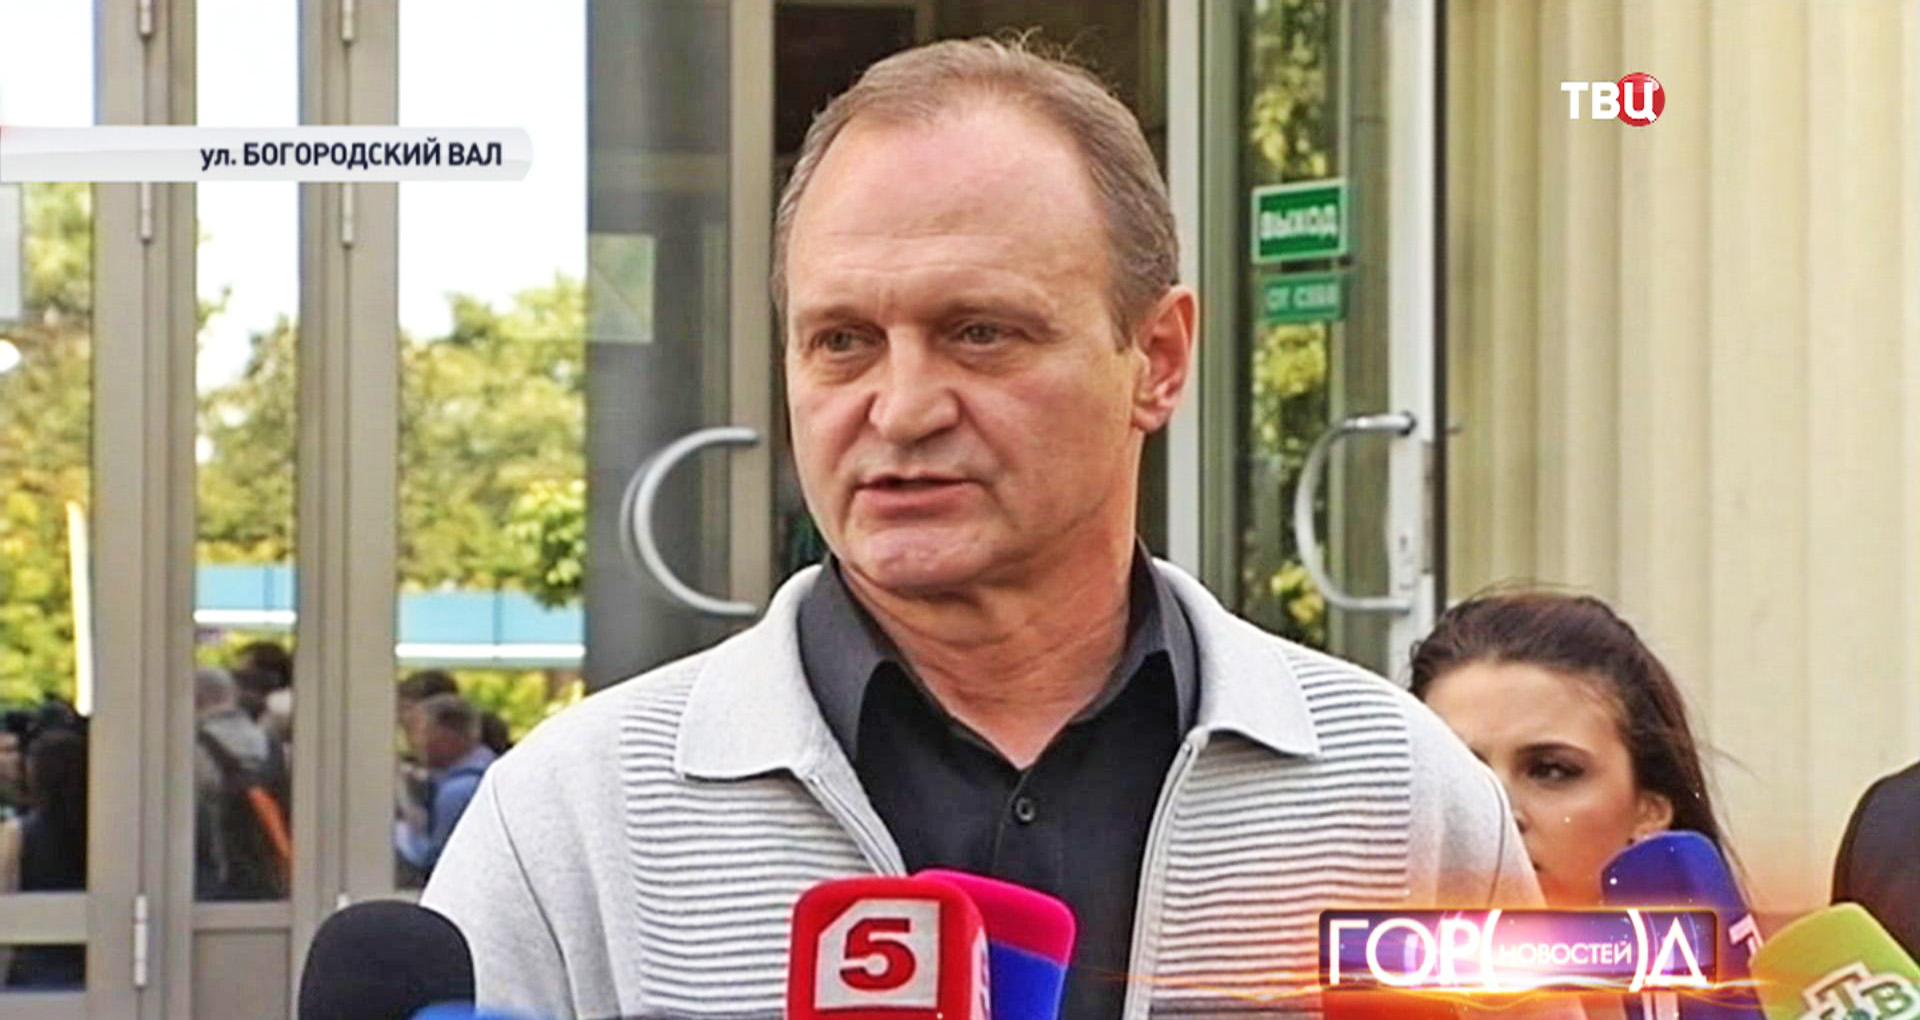 Владимир Щербаков, отец Егора Щербакова